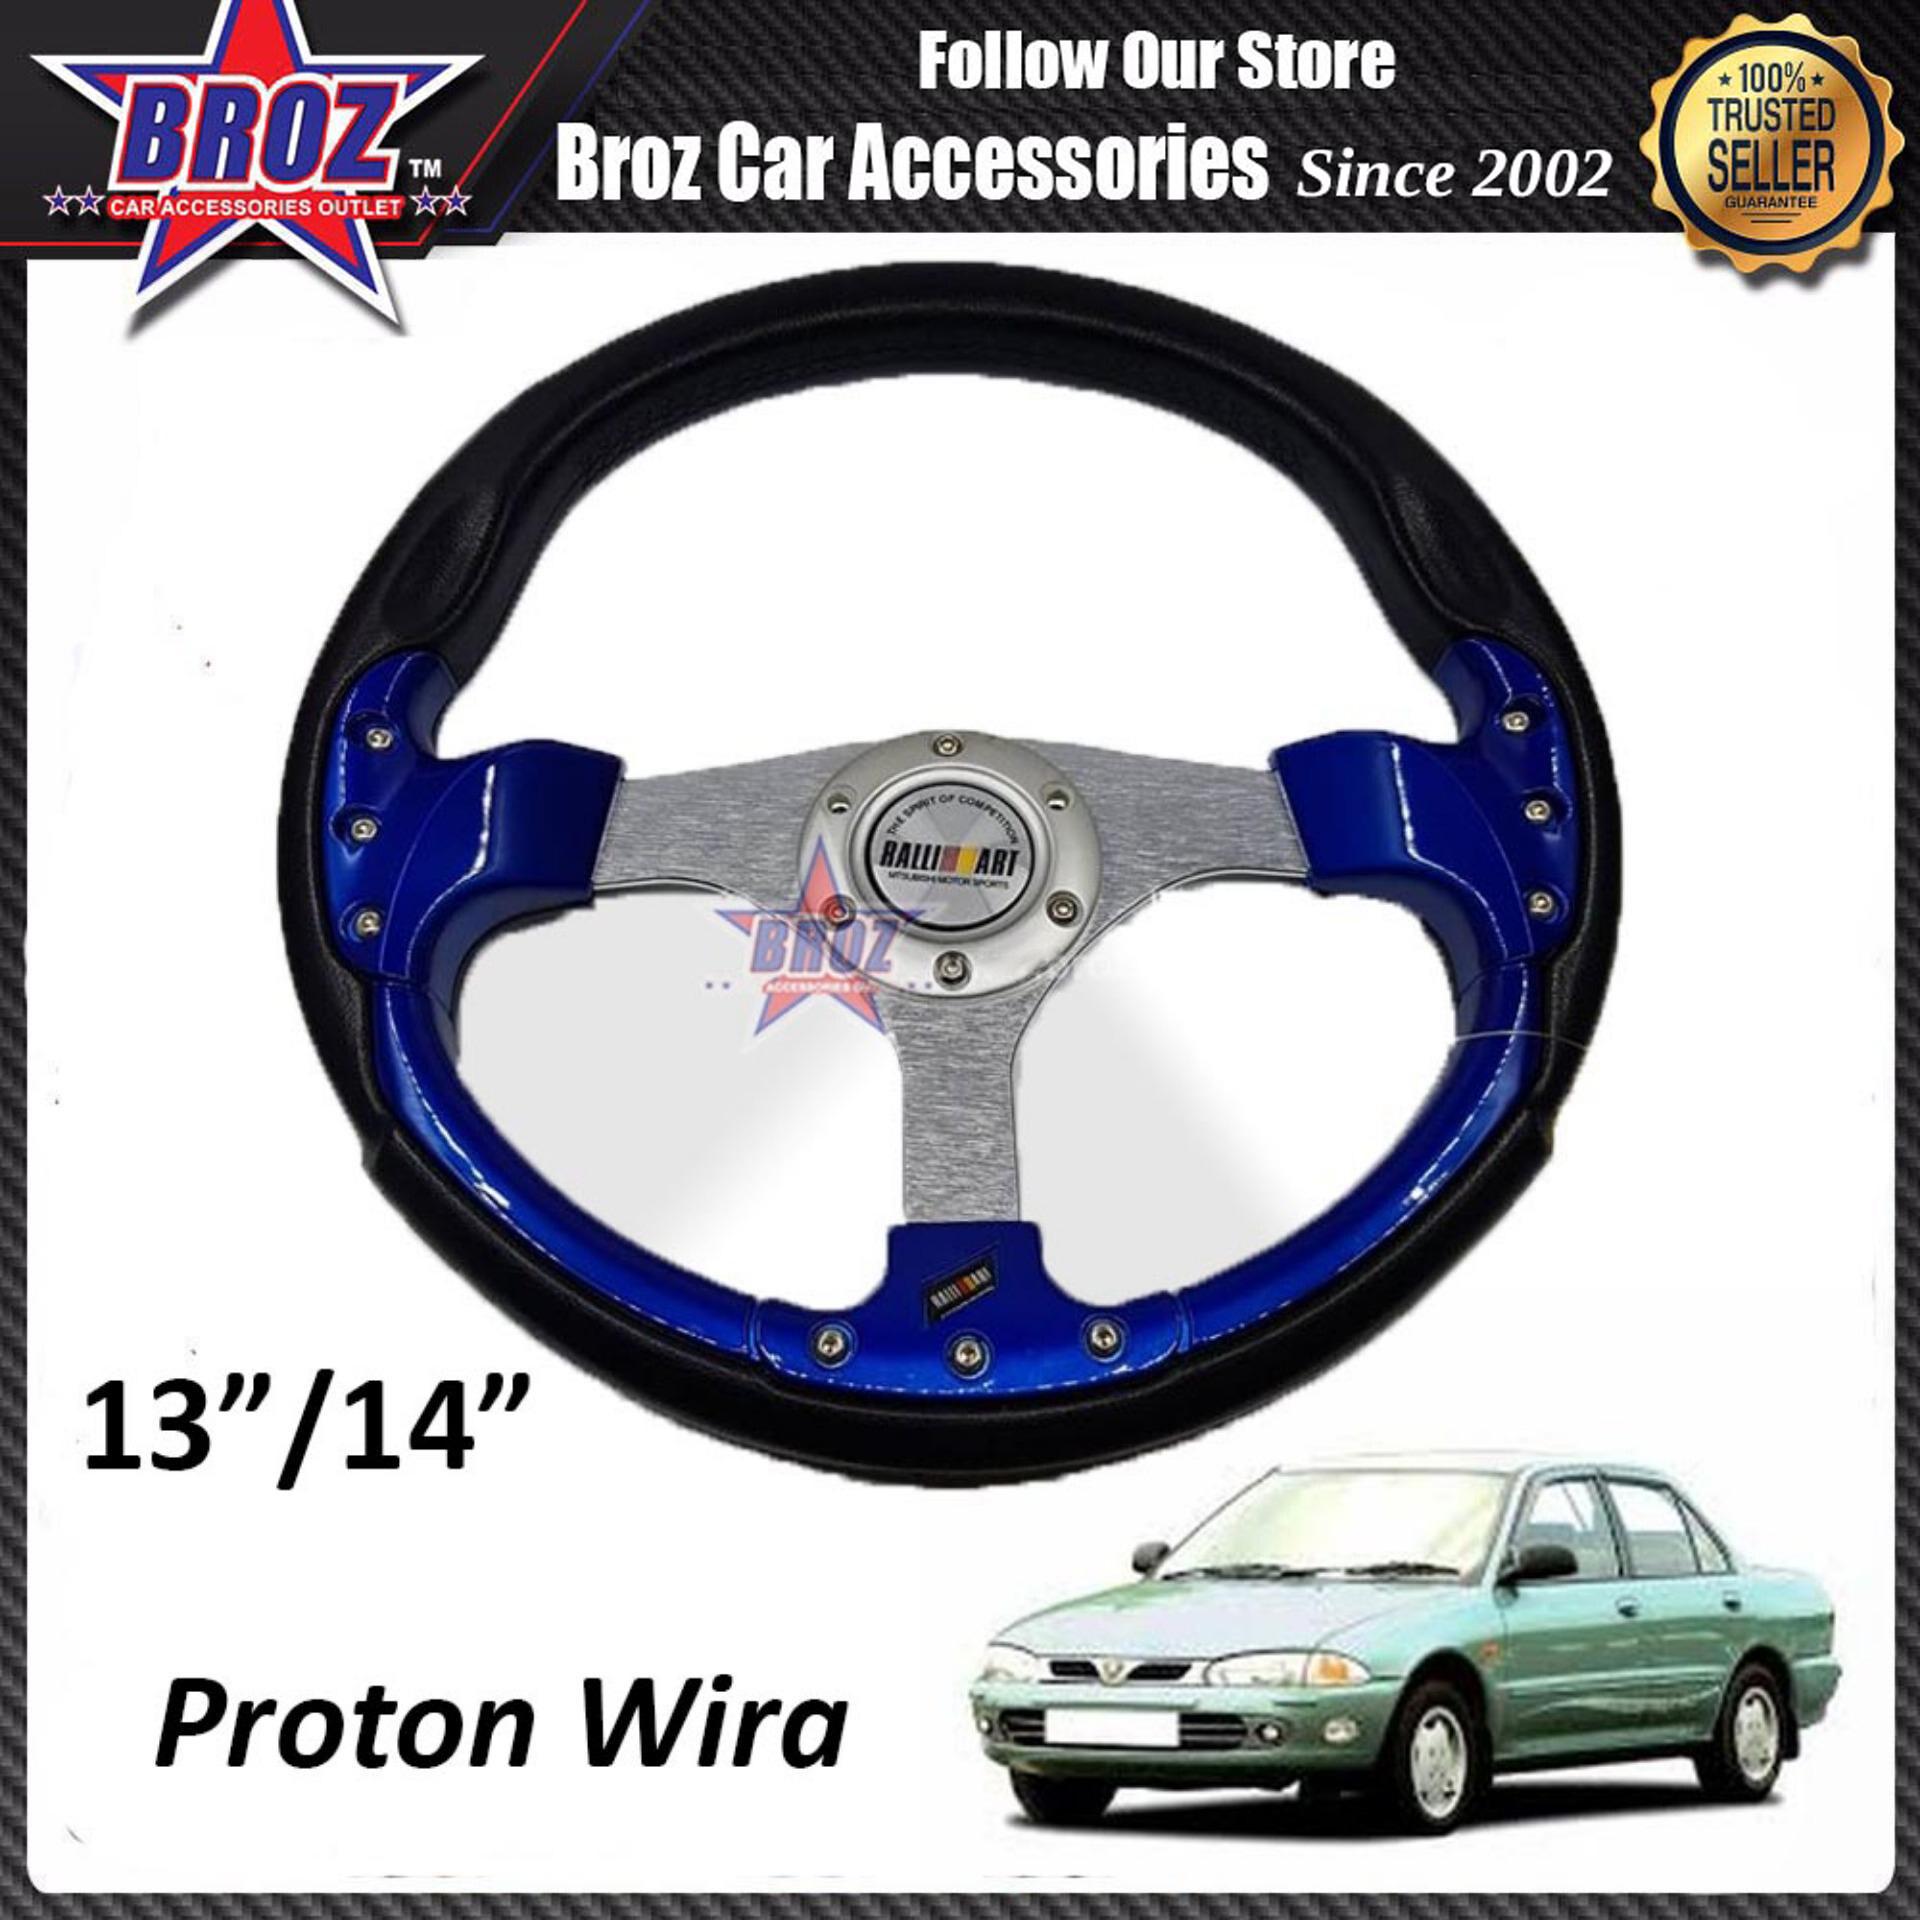 Wira 14  Inch Rally Art Blue Car Steering + Wheel Hub Adapter Boss Kit